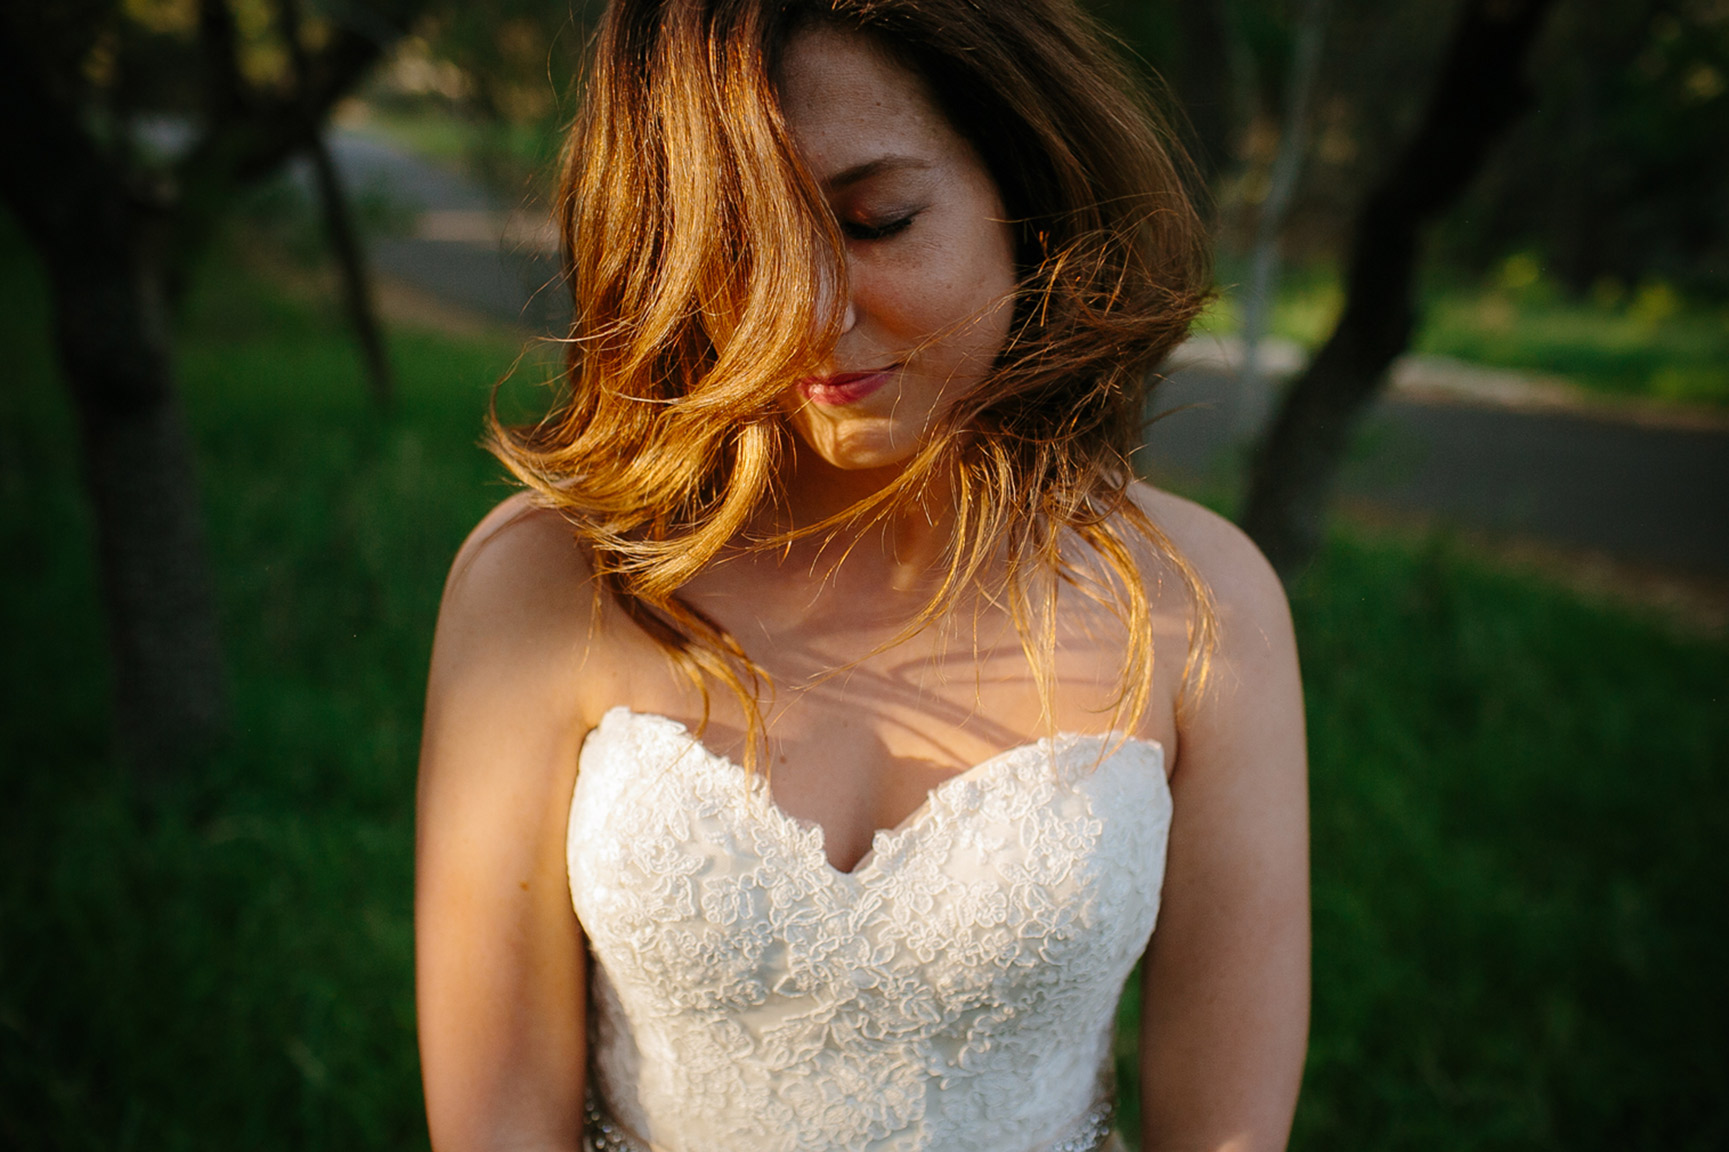 Austin_BRIDAL_WeddingPhotographer006.jpg